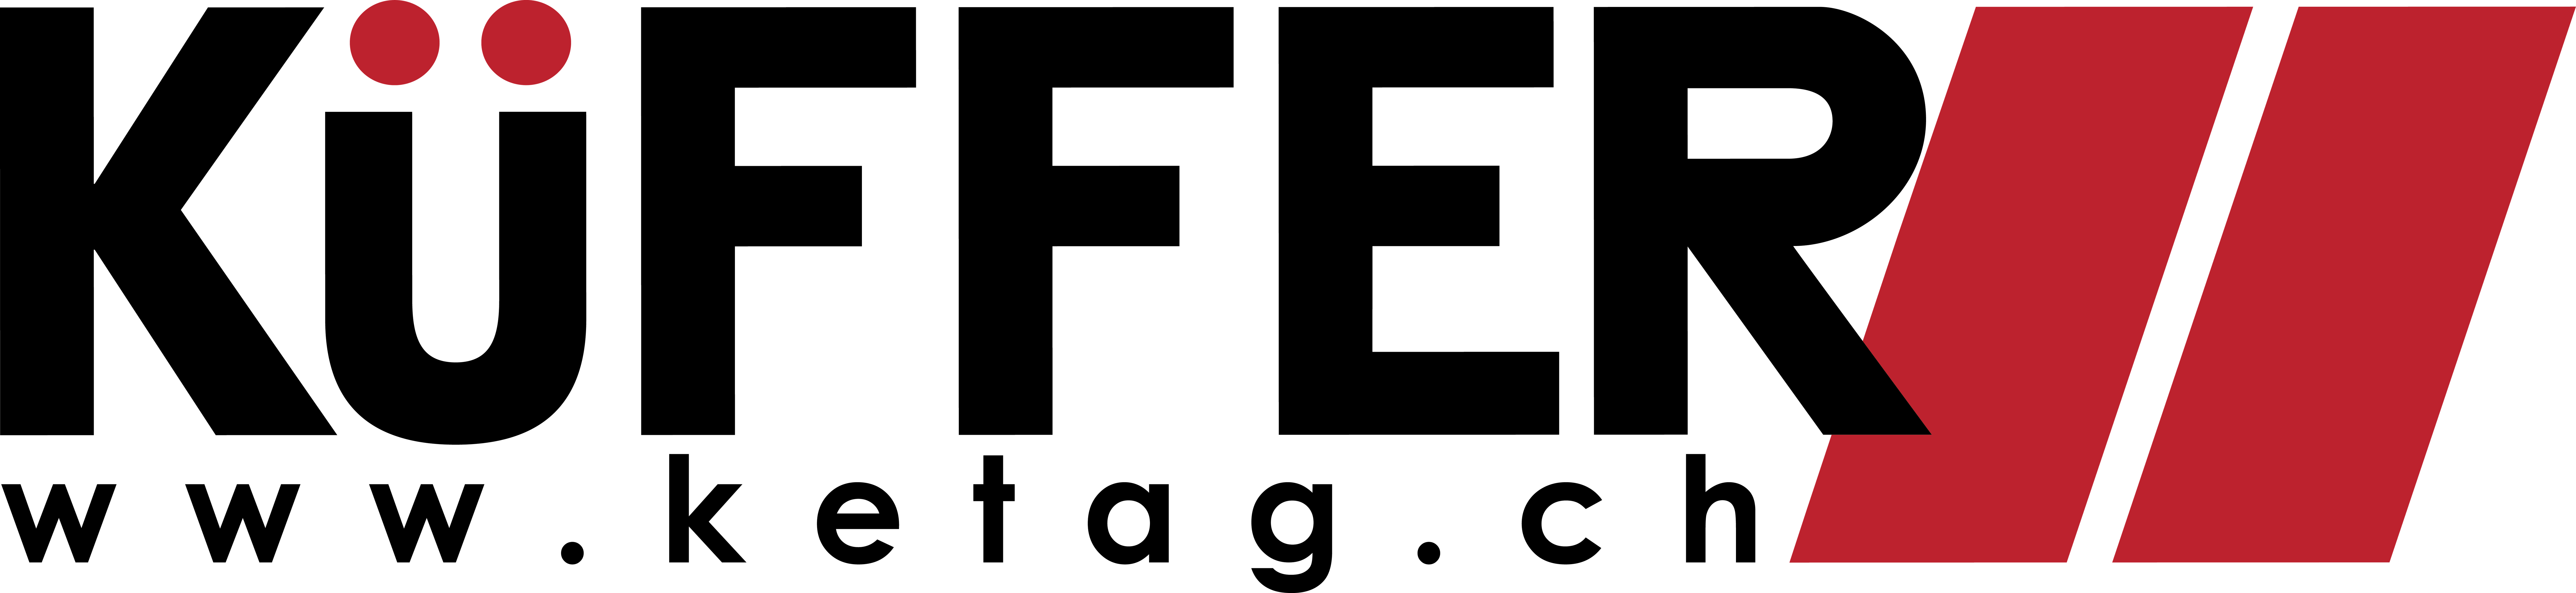 Küffer Elektro-Technik AG